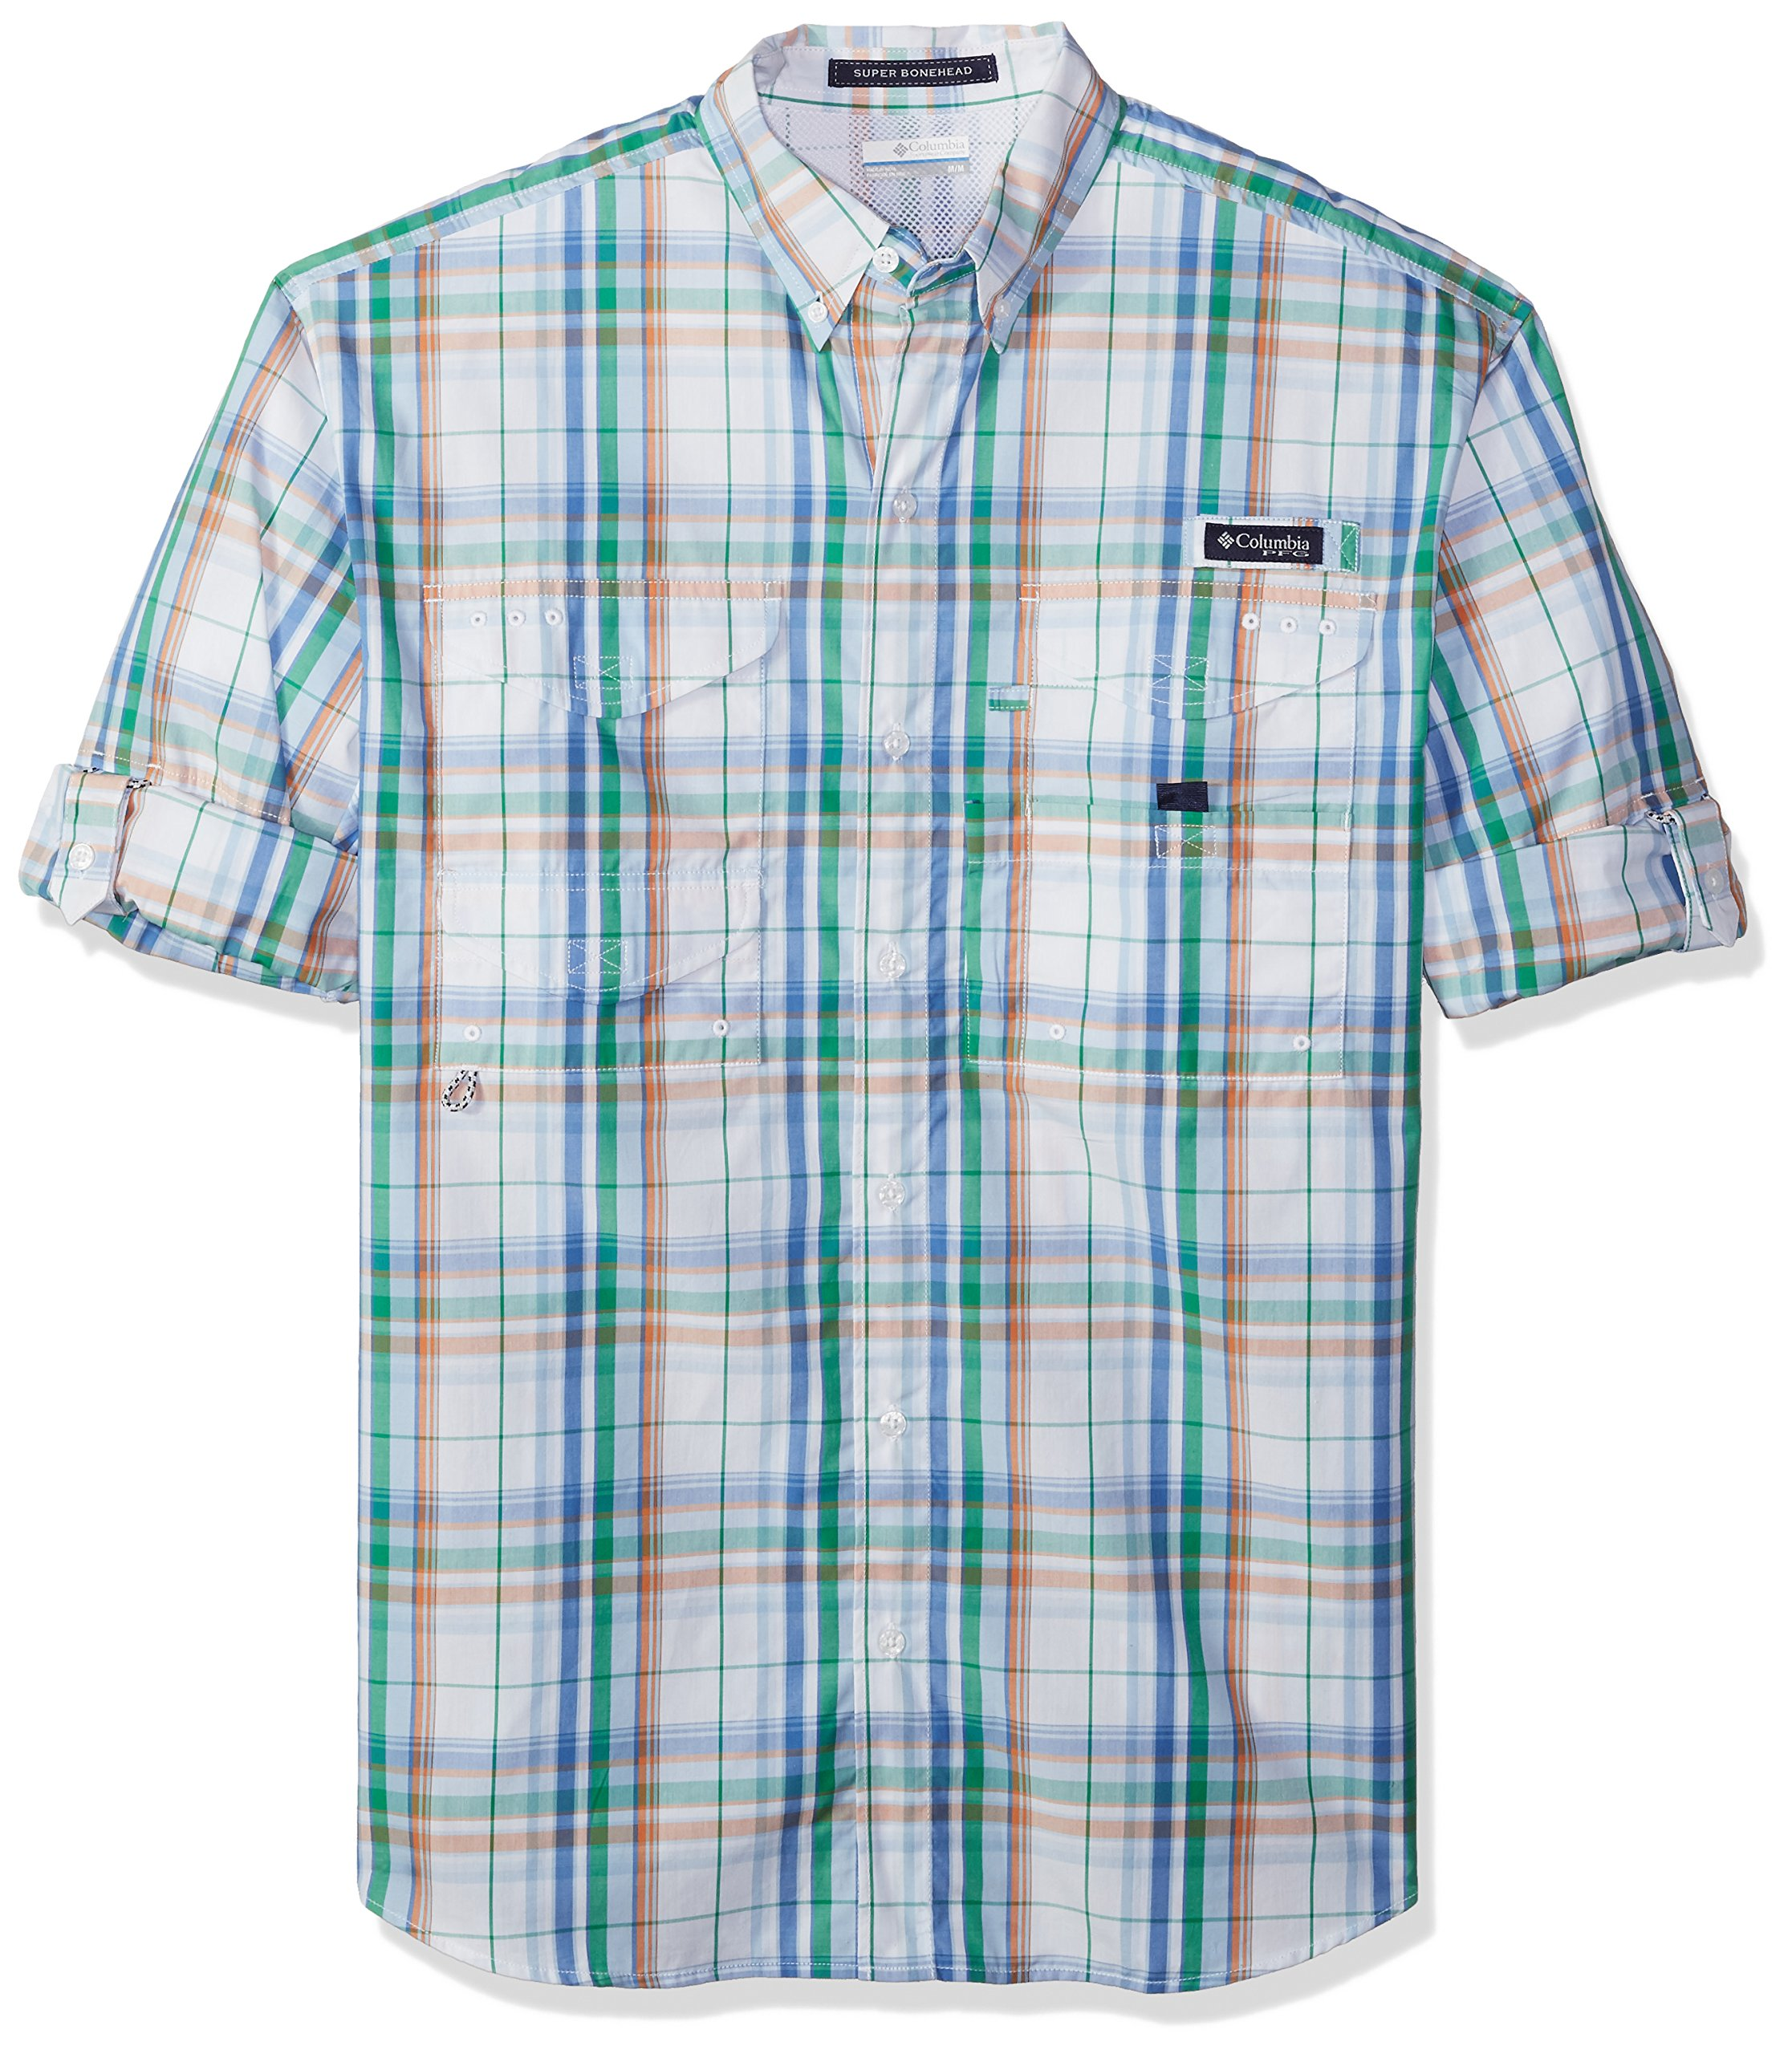 Columbia Men's Super Bonehead Classic Long Sleeve Shirt, Harbor Blue Plaid, Medium by Columbia